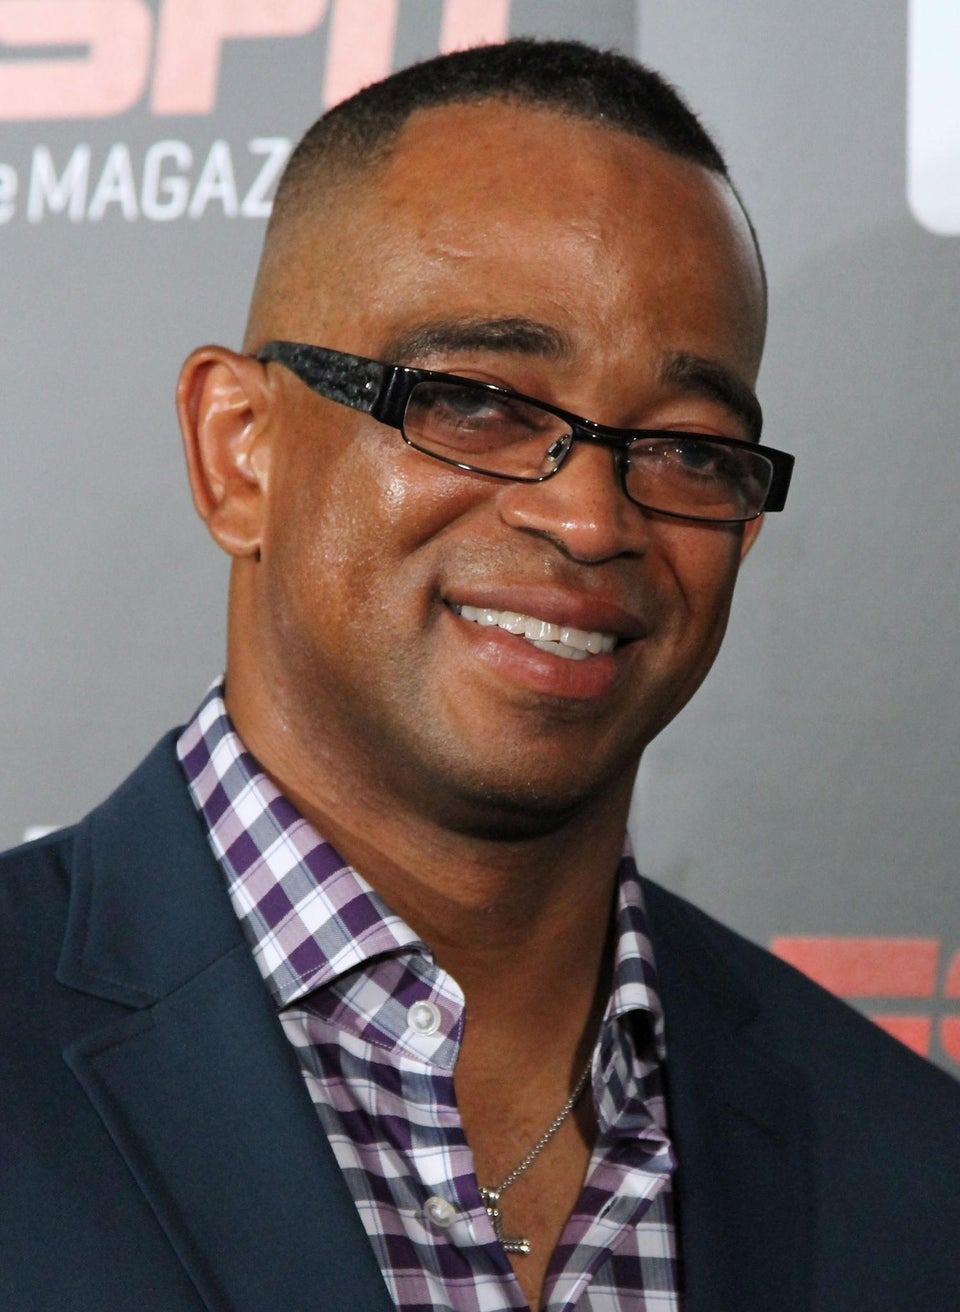 Coffee Talk: ESPN Anchor Stuart Scott Diagnosed with Cancer Again